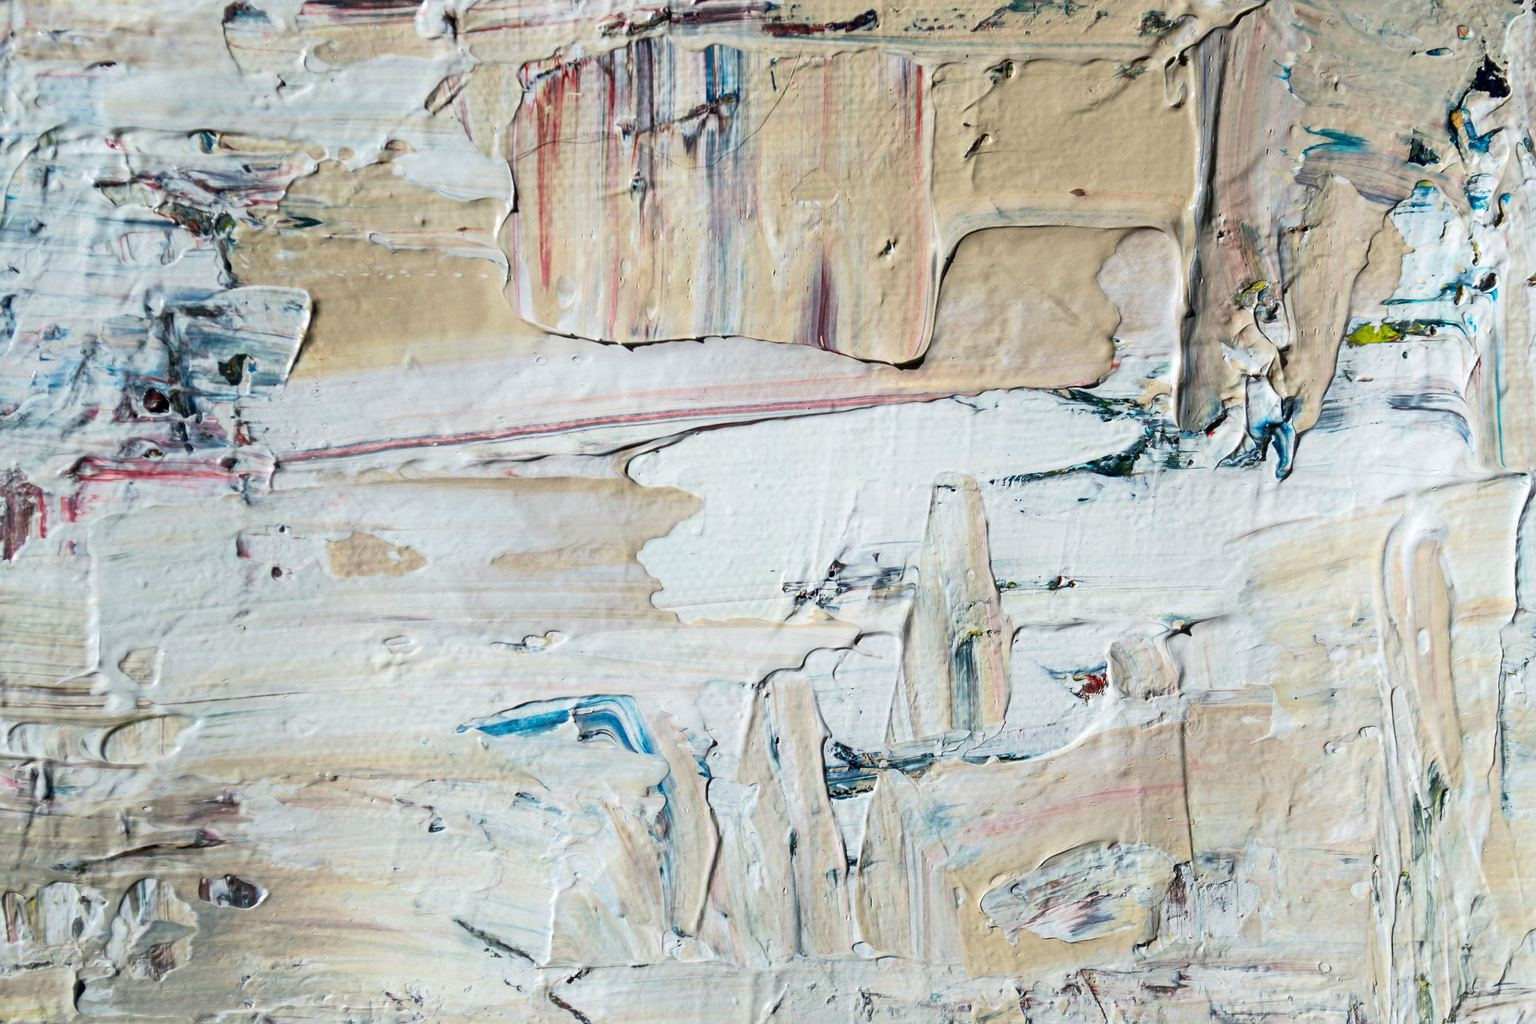 Pintura sobre lienzo que ofrece sensación de tacto visual